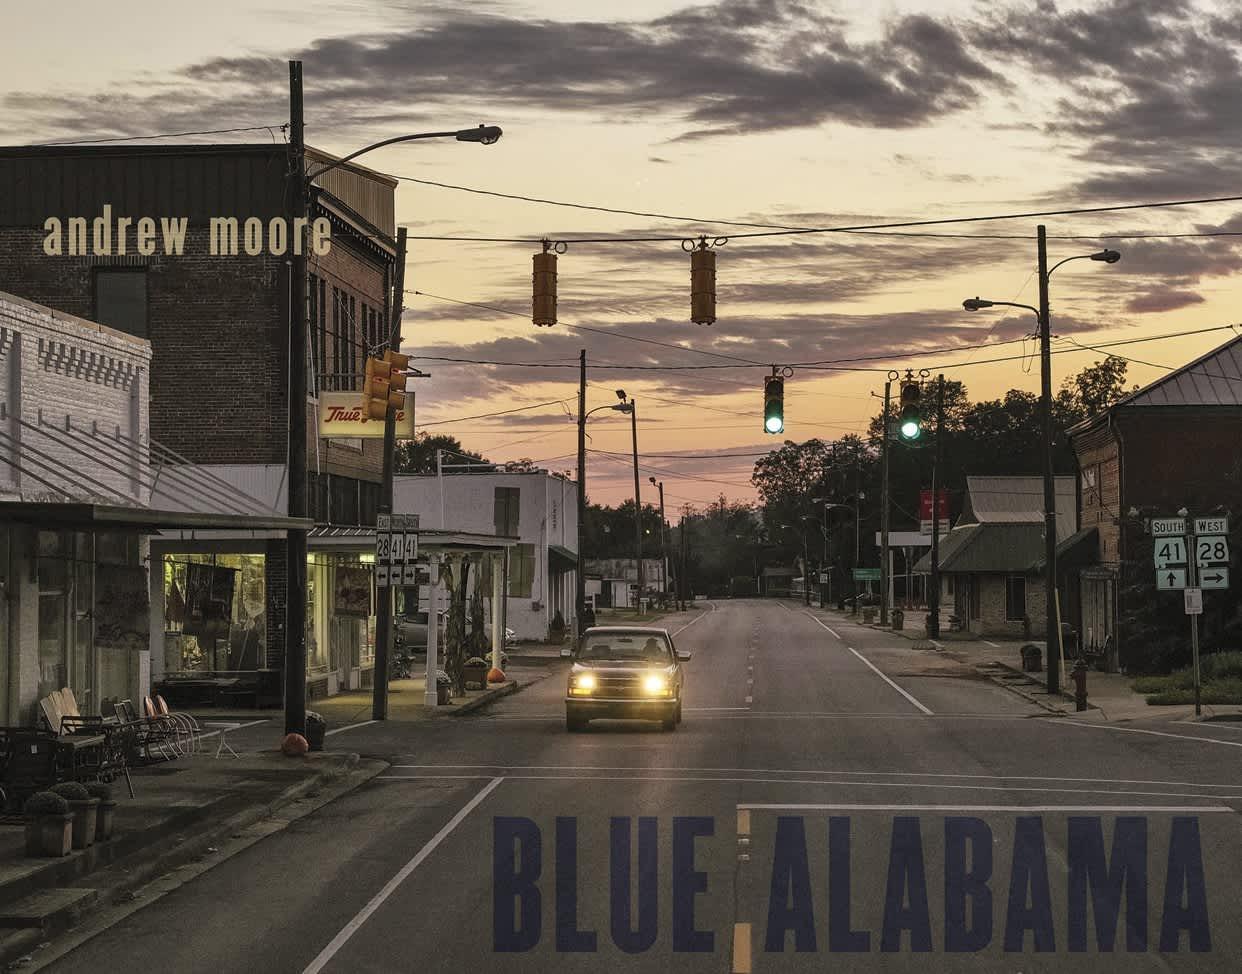 Andrew Moore: Blue Alabama